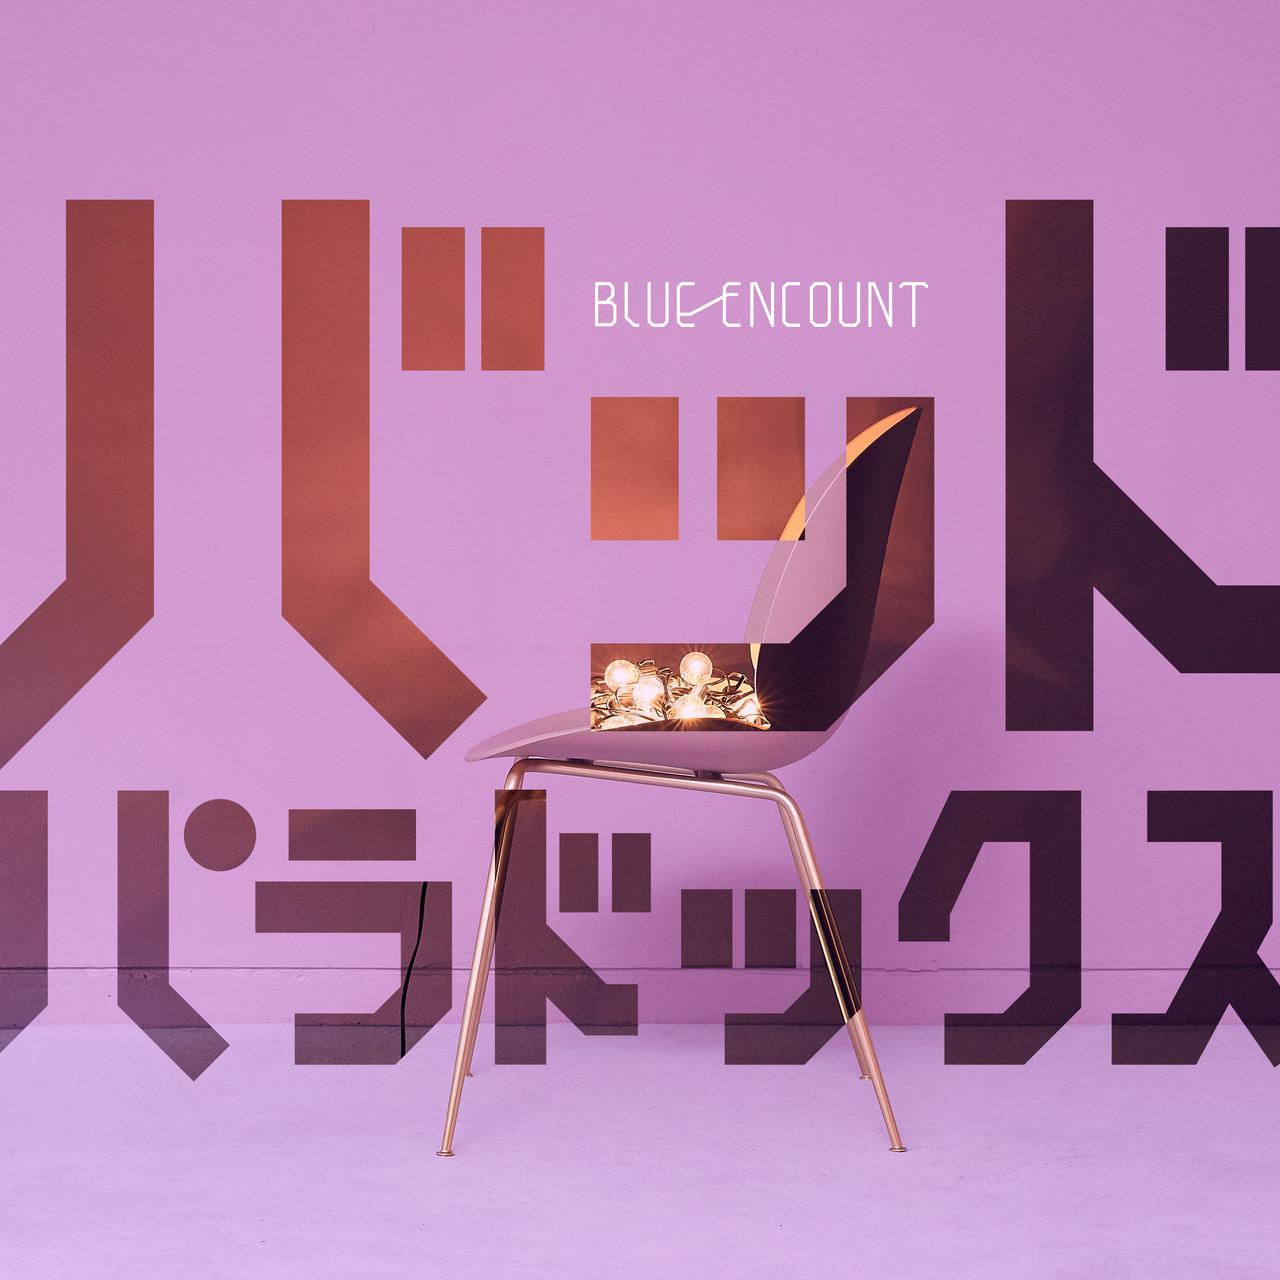 BLUE ENCOUNT 「バッドパラドックス」CD Jacket / Artist photo